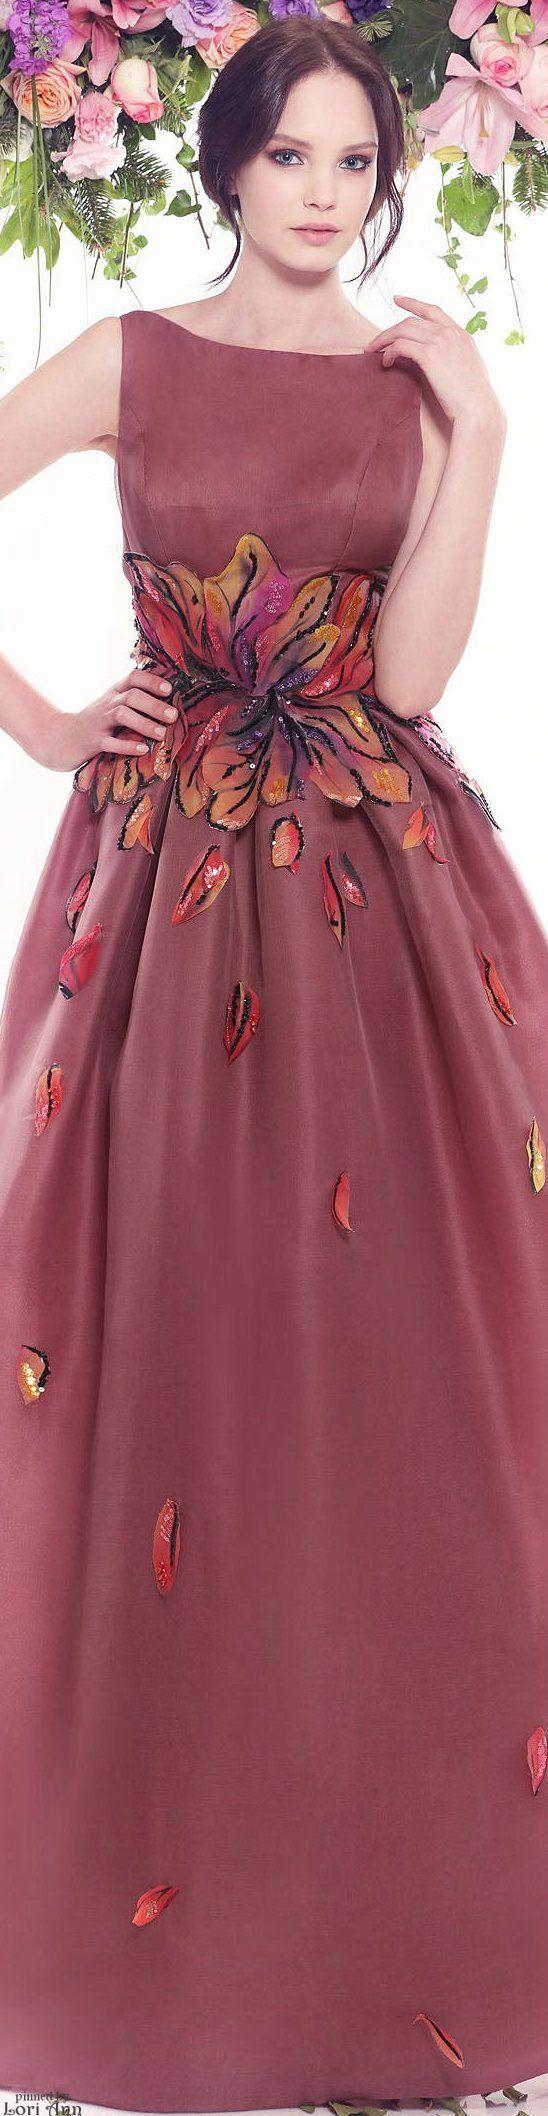 burgundy maxi dress @roressclothes closet ideas women fashion outfit clothing style Fadwa Baalbaki Couture Spring 2016: